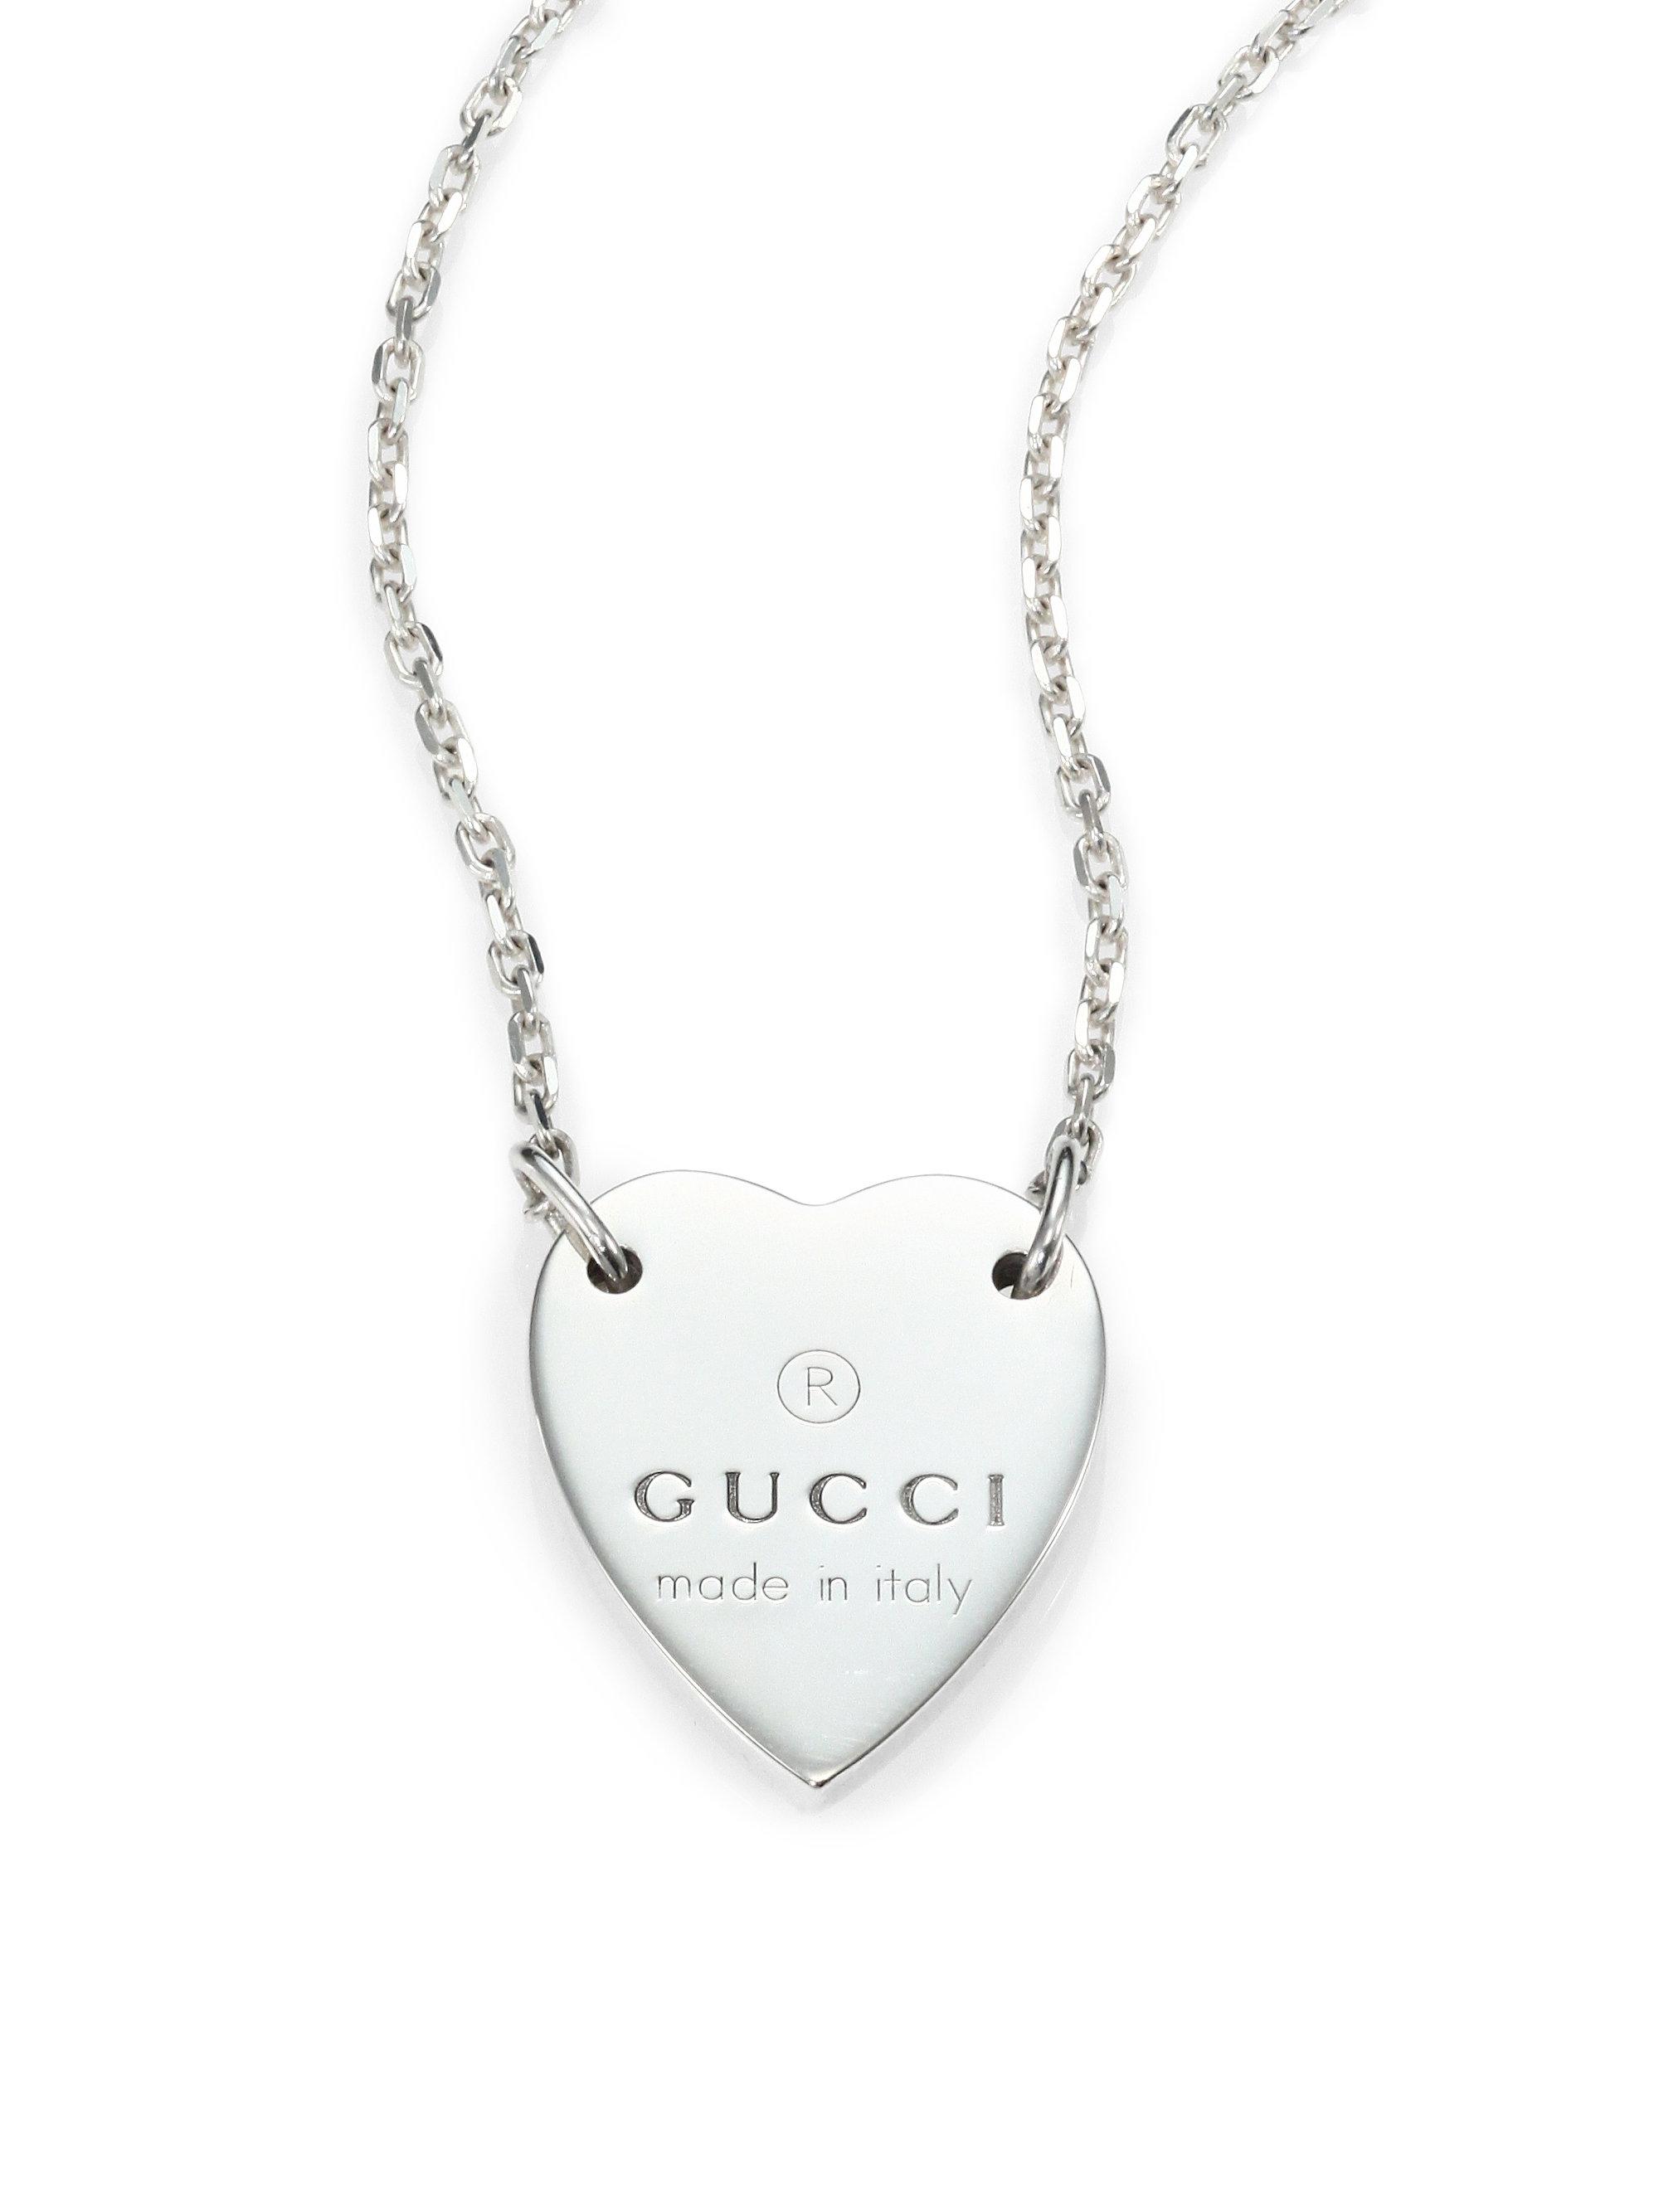 Gucci Sterling Silver Signature Heart Pendant Necklace In